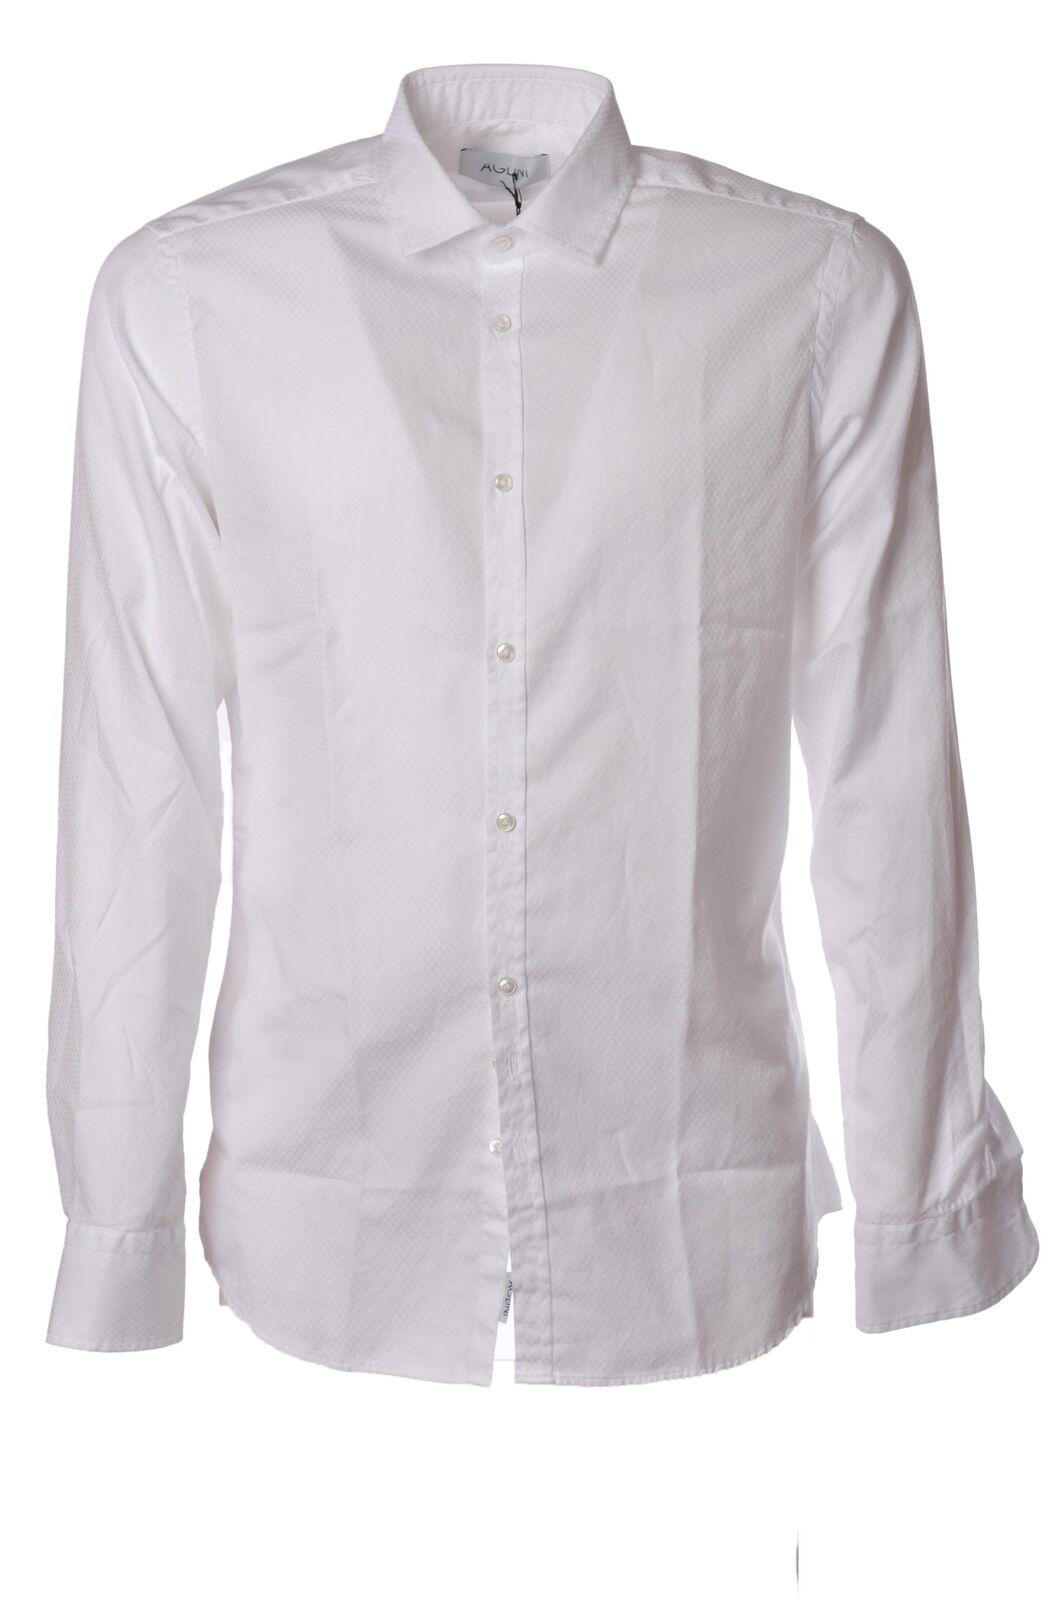 Aglini  -  Shirt - Male - Weiß - 2365726N174100